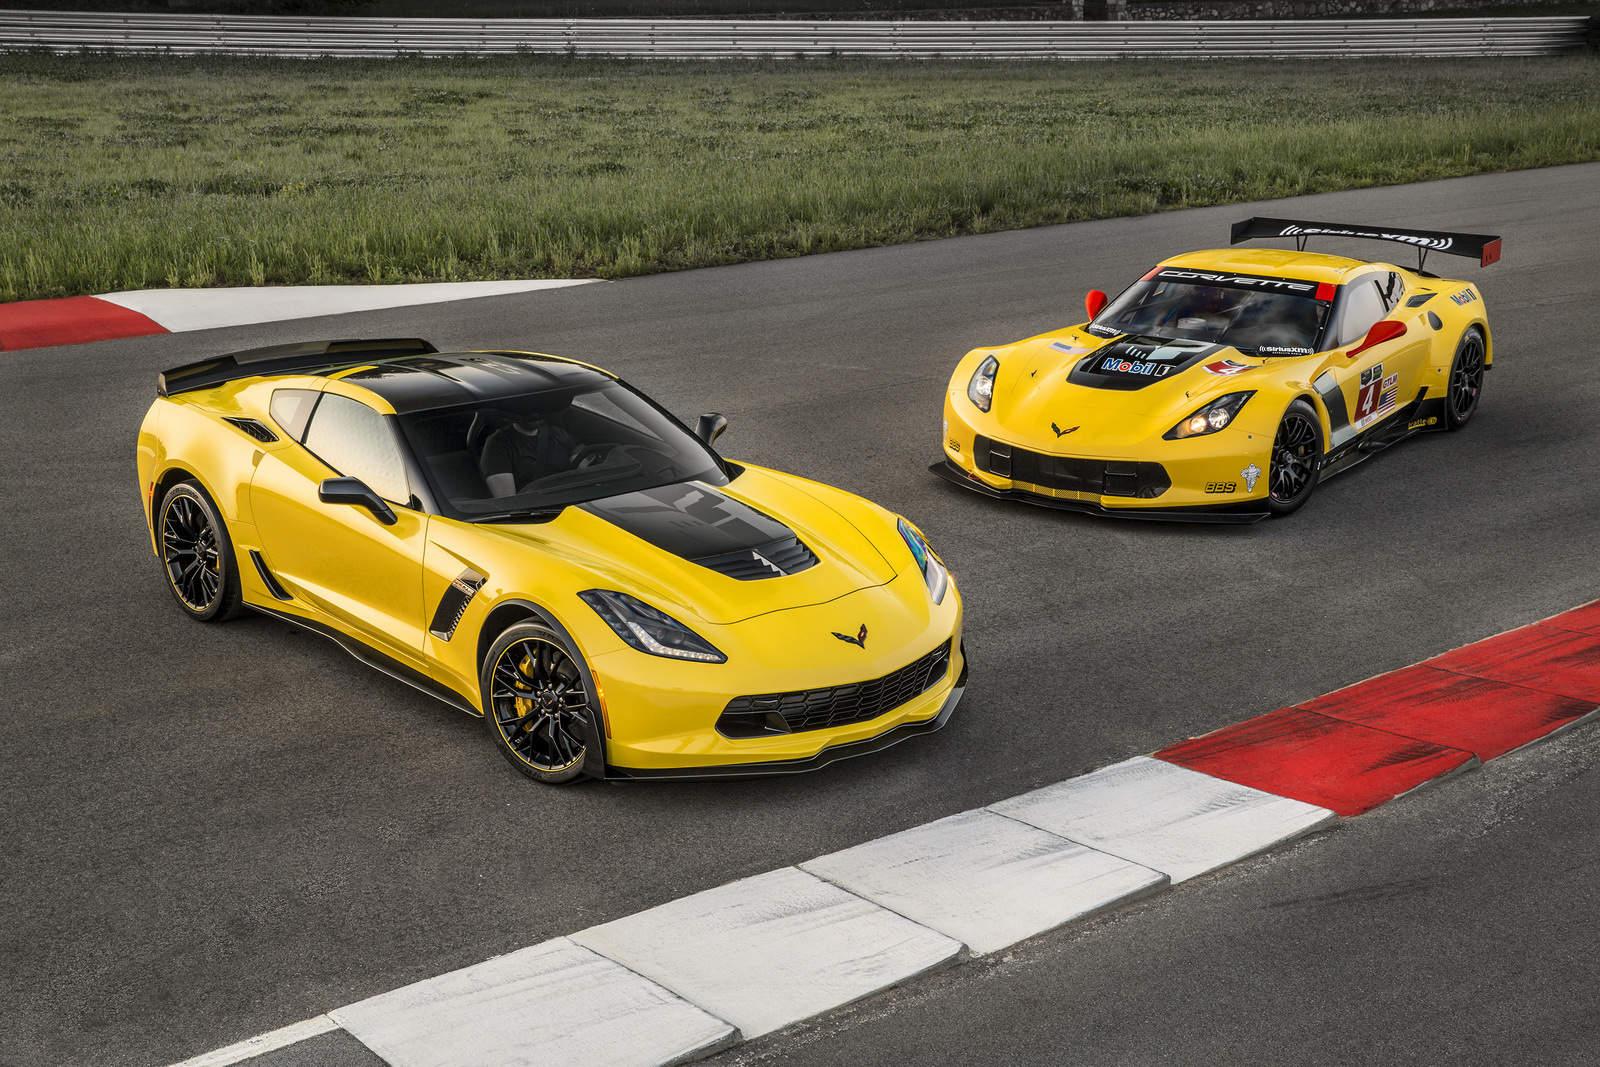 2016 Corvette Z07 >> The 2016 Corvette Z06 C7 R Edition Is Inspired From The C7 R